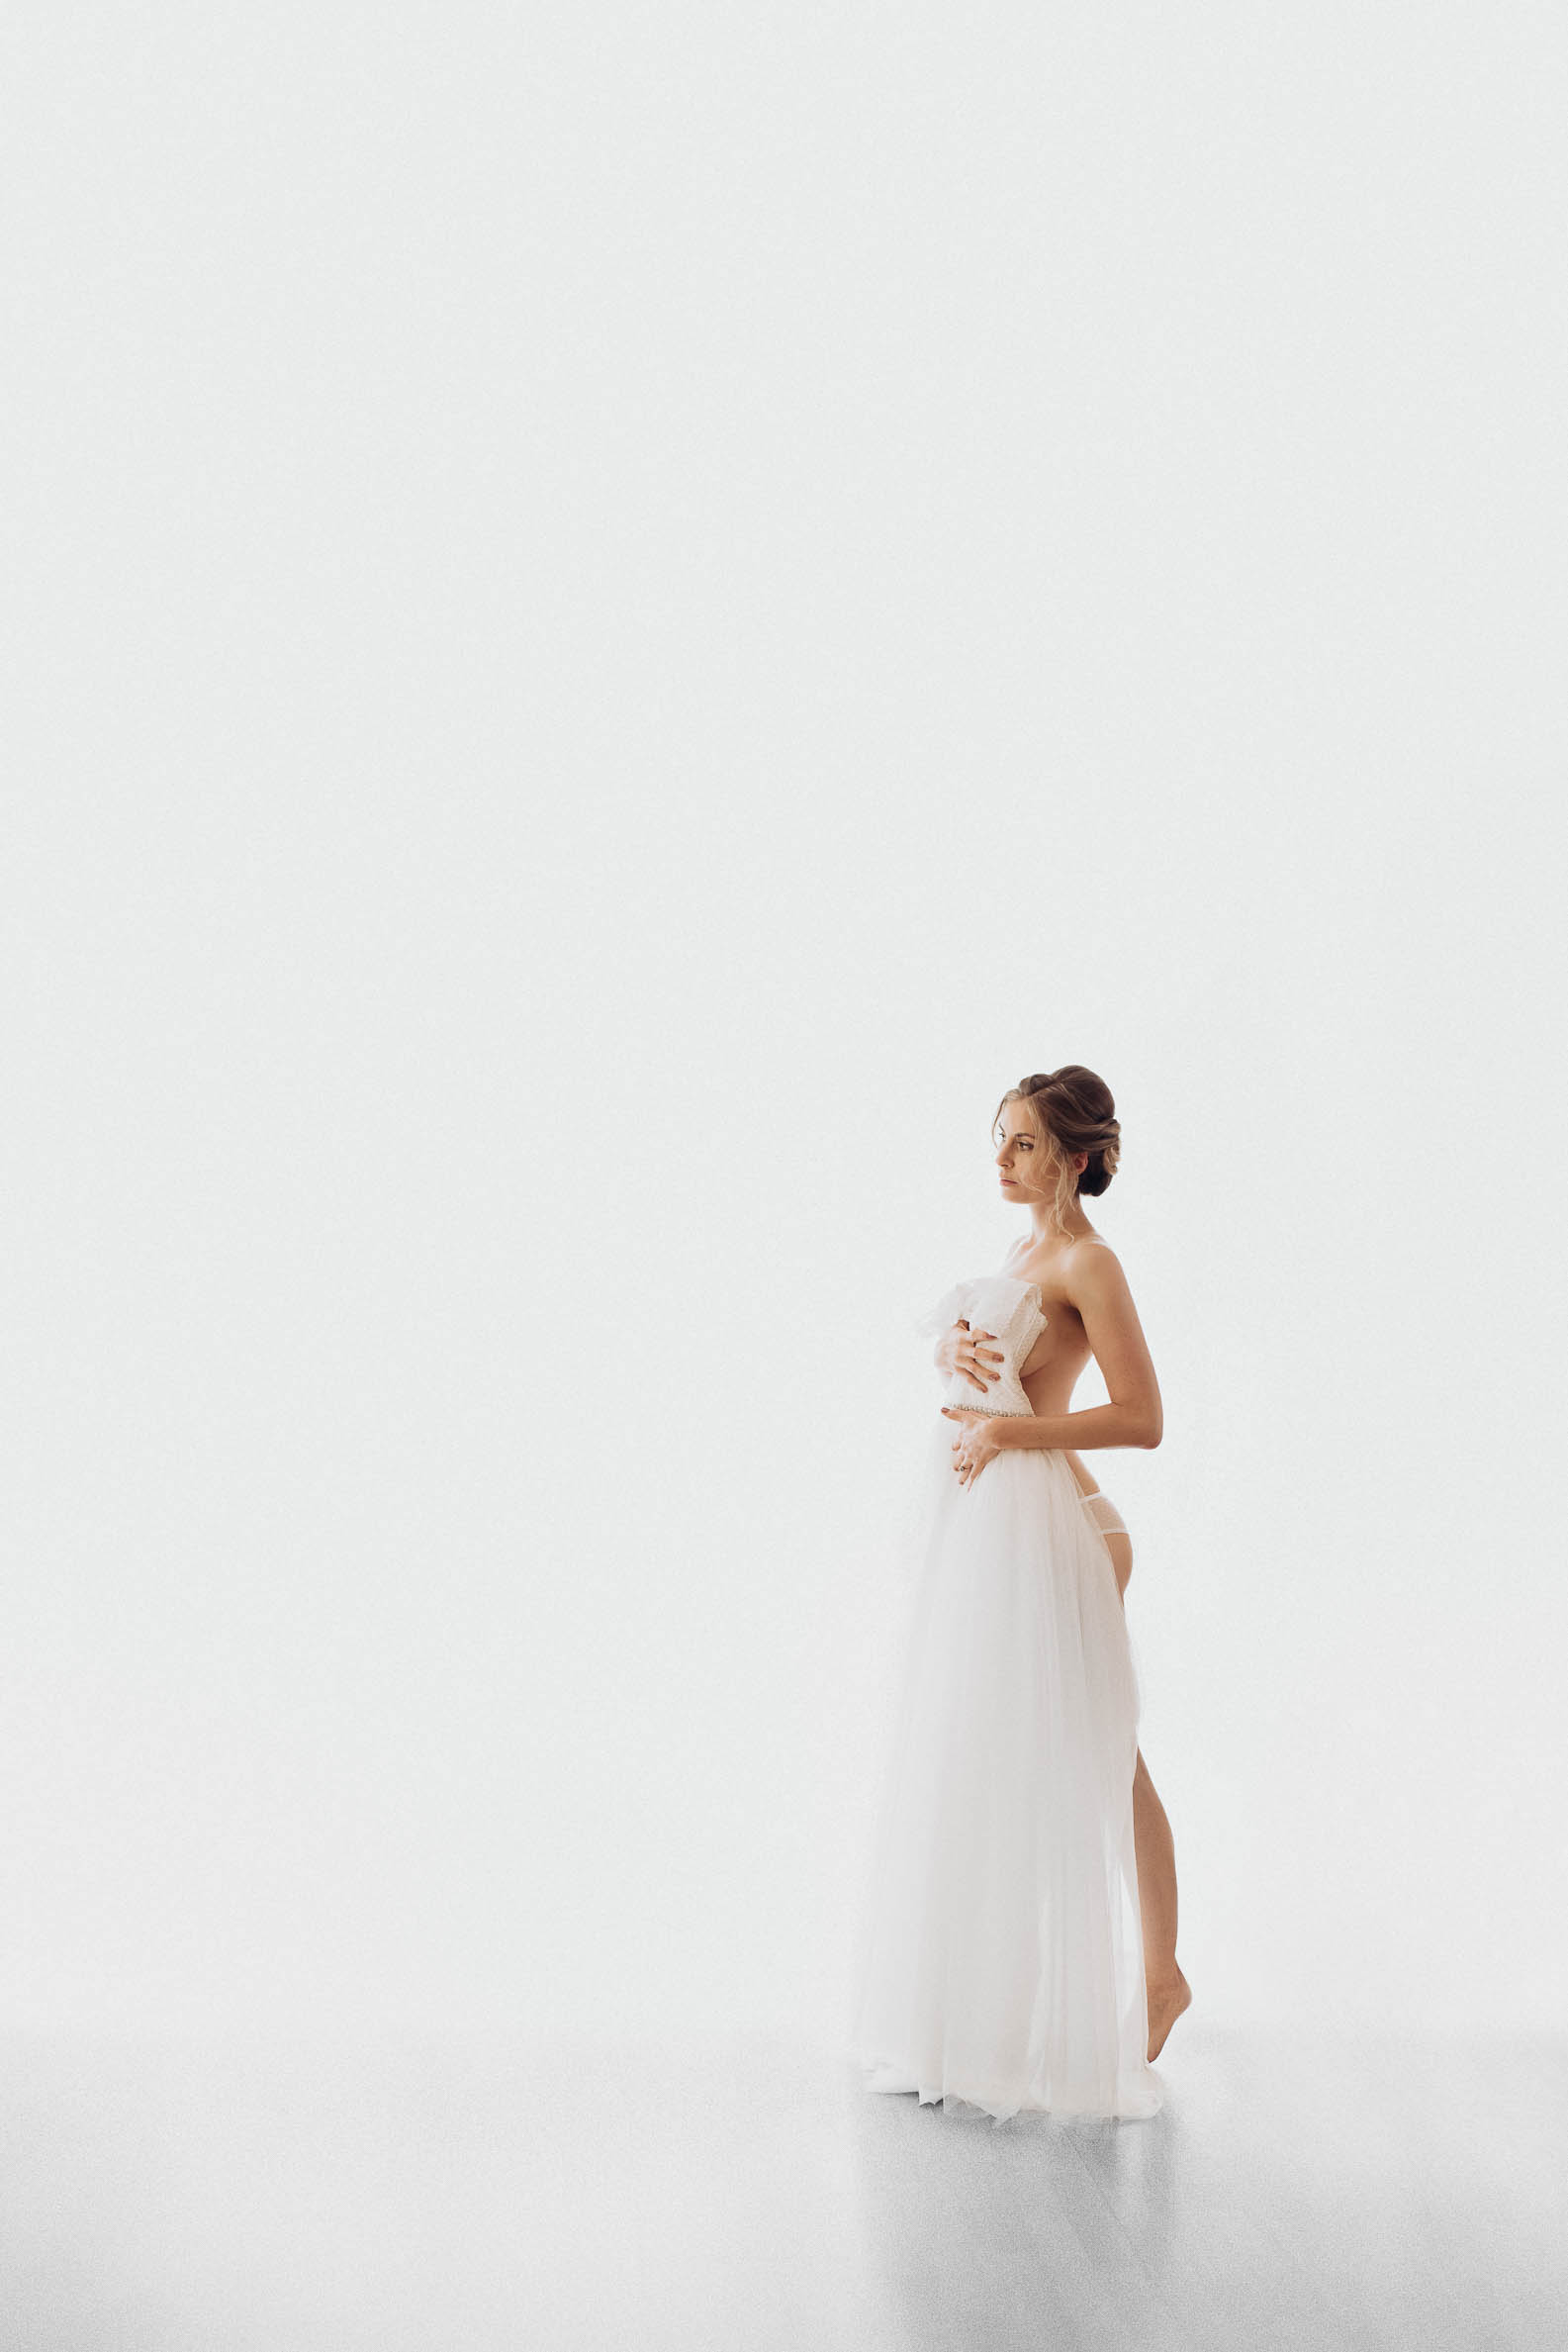 Braut Boudoir Ideen Fotos Fotograf Preise